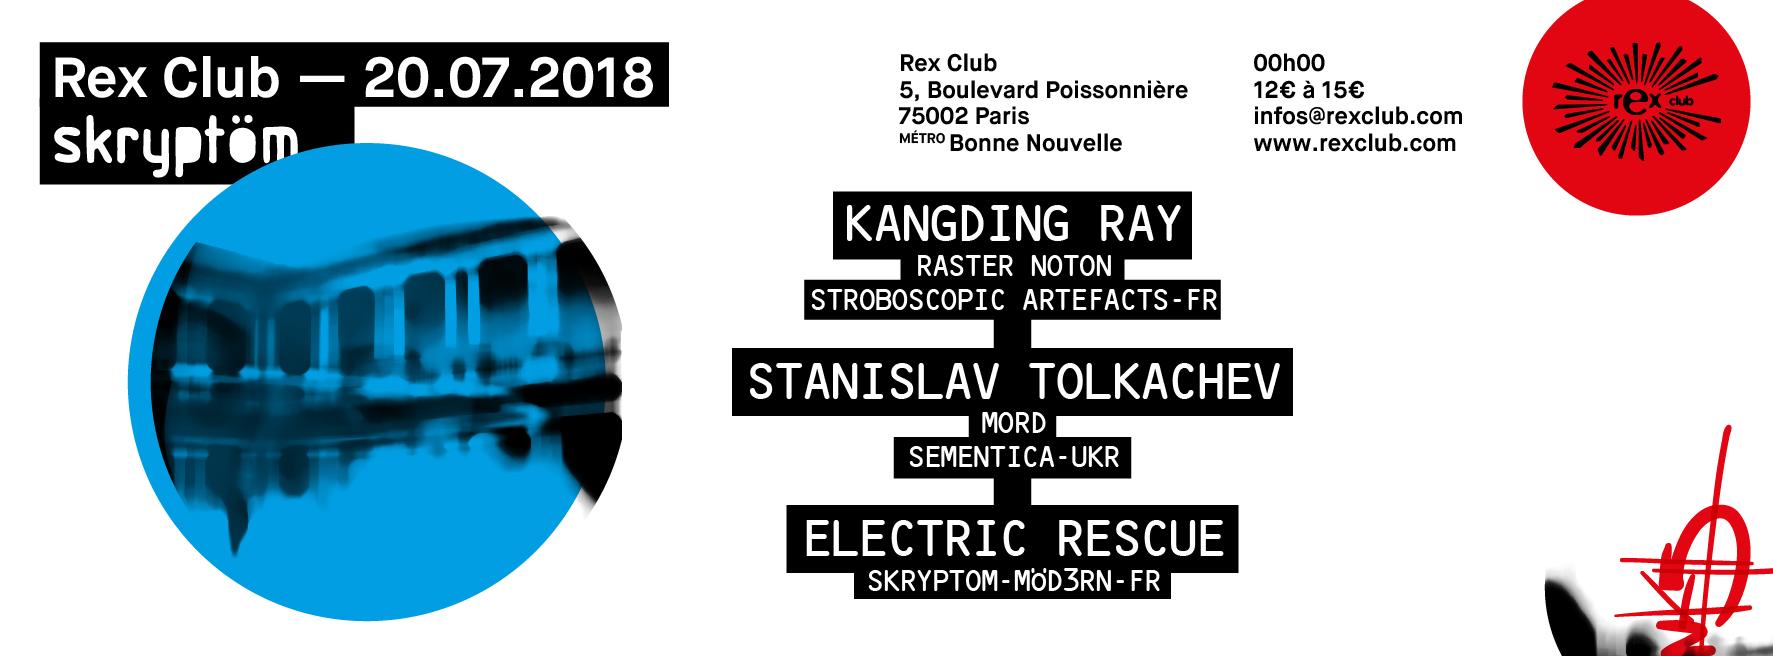 Skryptom: Kangding Ray, Stanislav Tolkachev, Electric Rescue